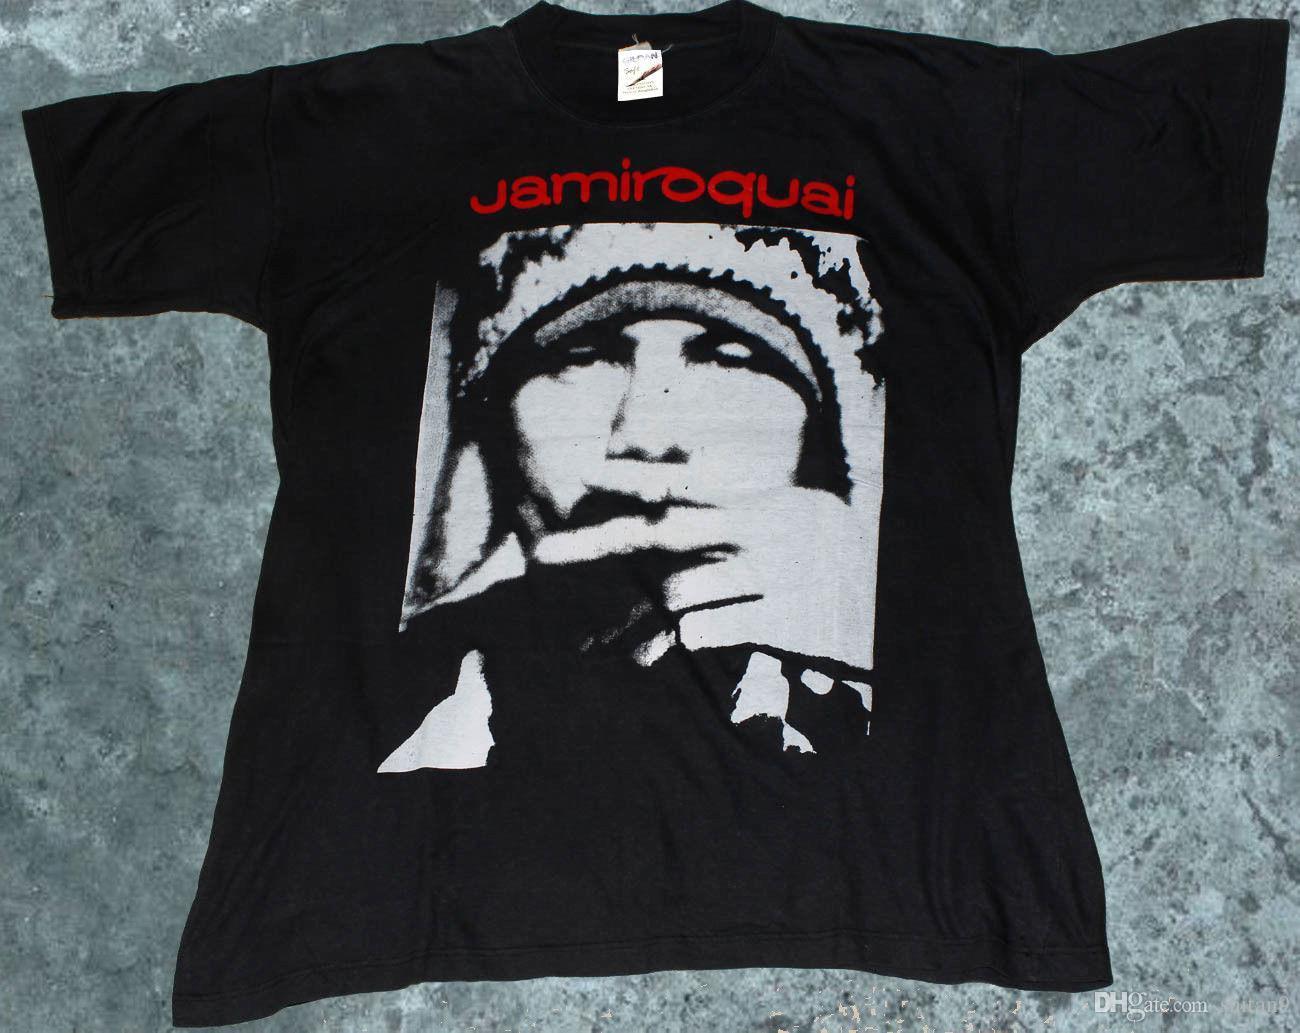 6ff0ed91b0e7f rare 1996 EUROPE TOUR JAMIROQUAI T-SHIRT vintage Reprint SILHOUETTE  Alternative High Quality Custom Printed Tops Hipster Tees T-Shirt